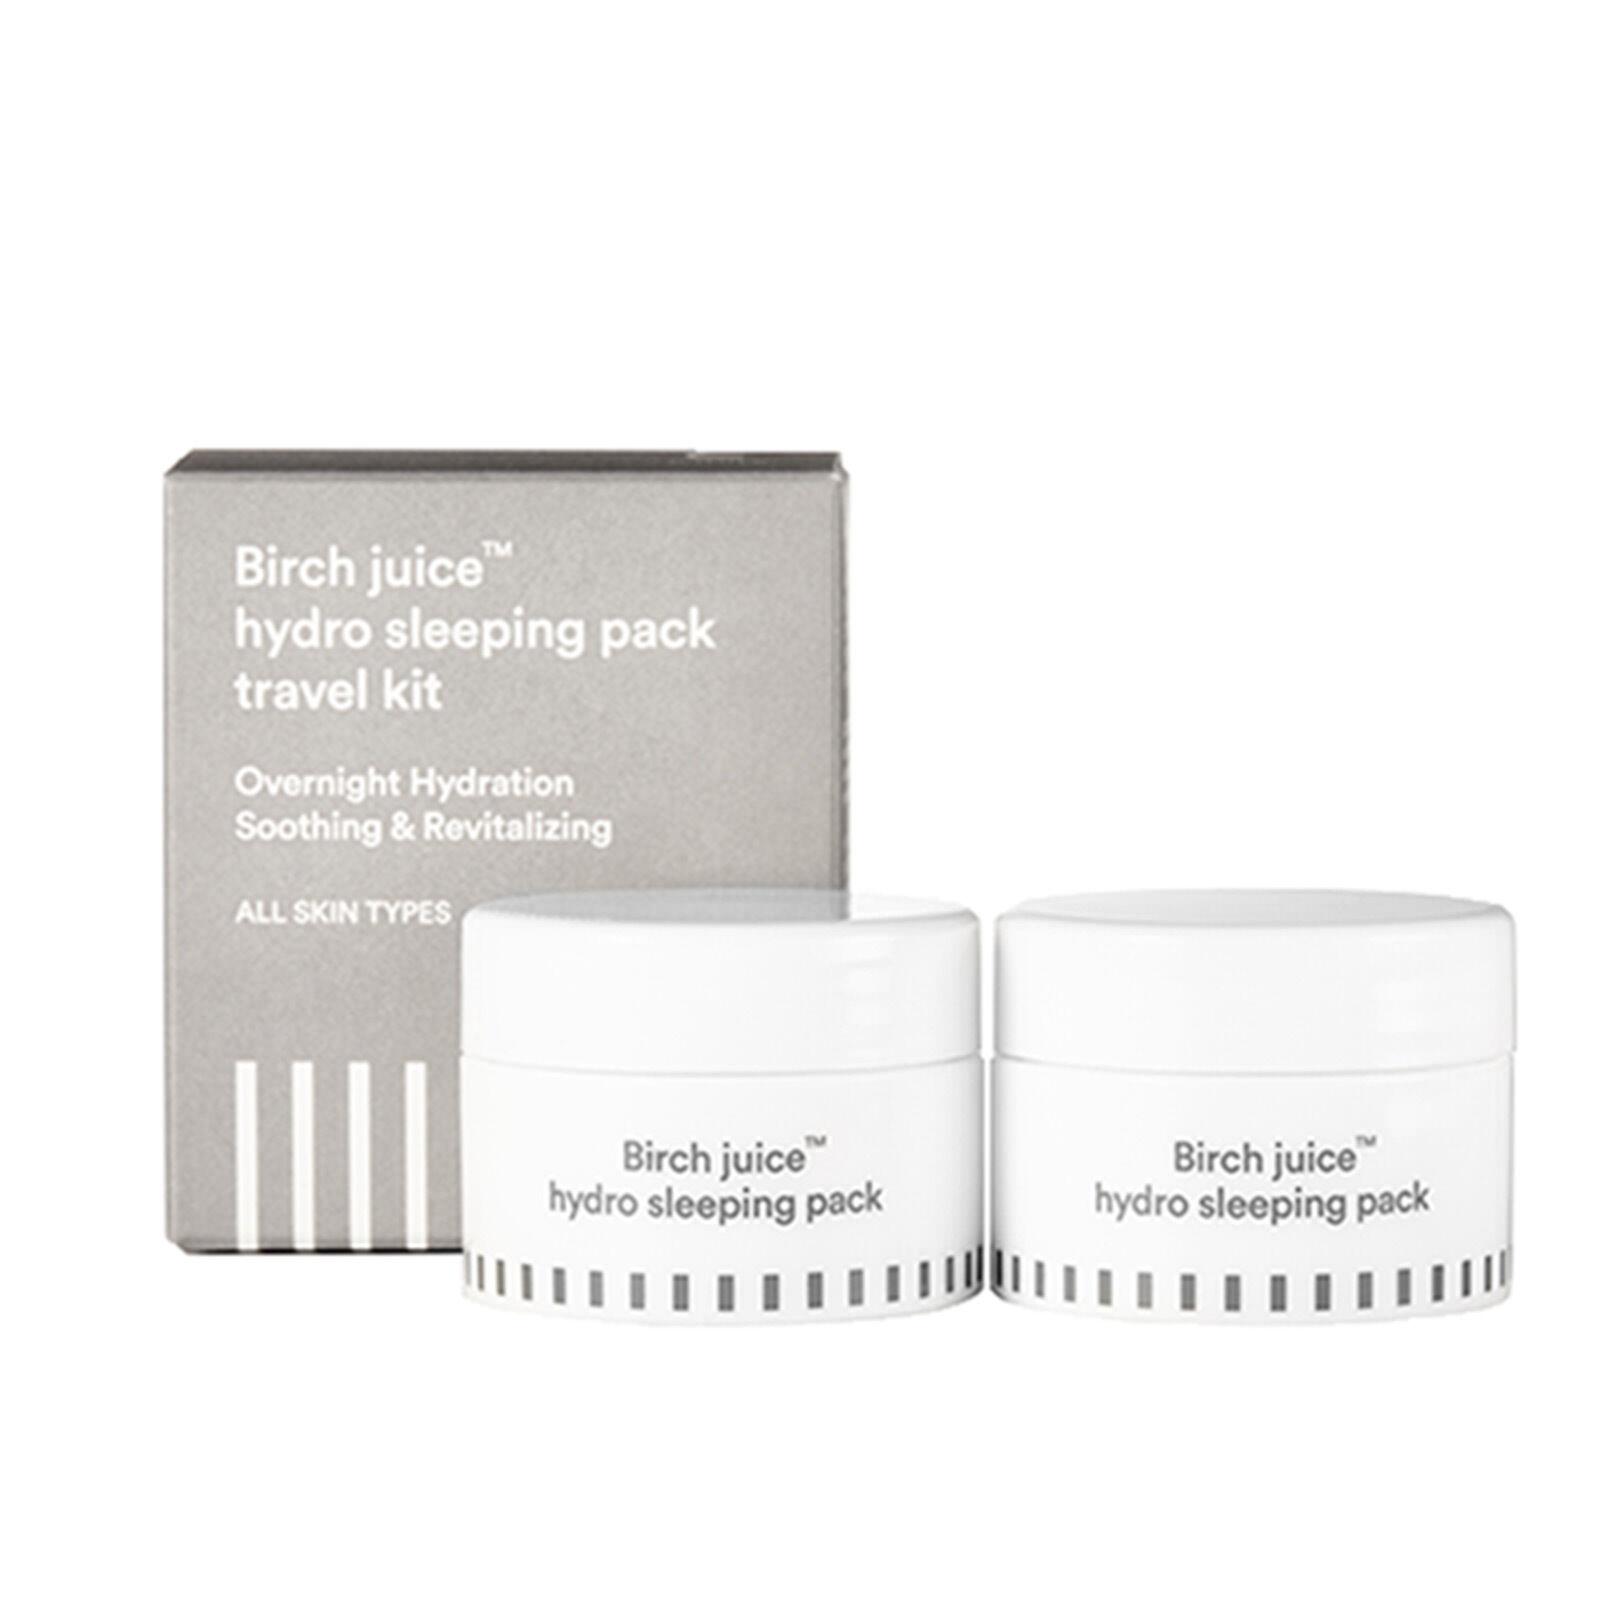 ENATURE Birch juice™ hydro sleeping pack travel Kit Korean K Cosmetic Beauty